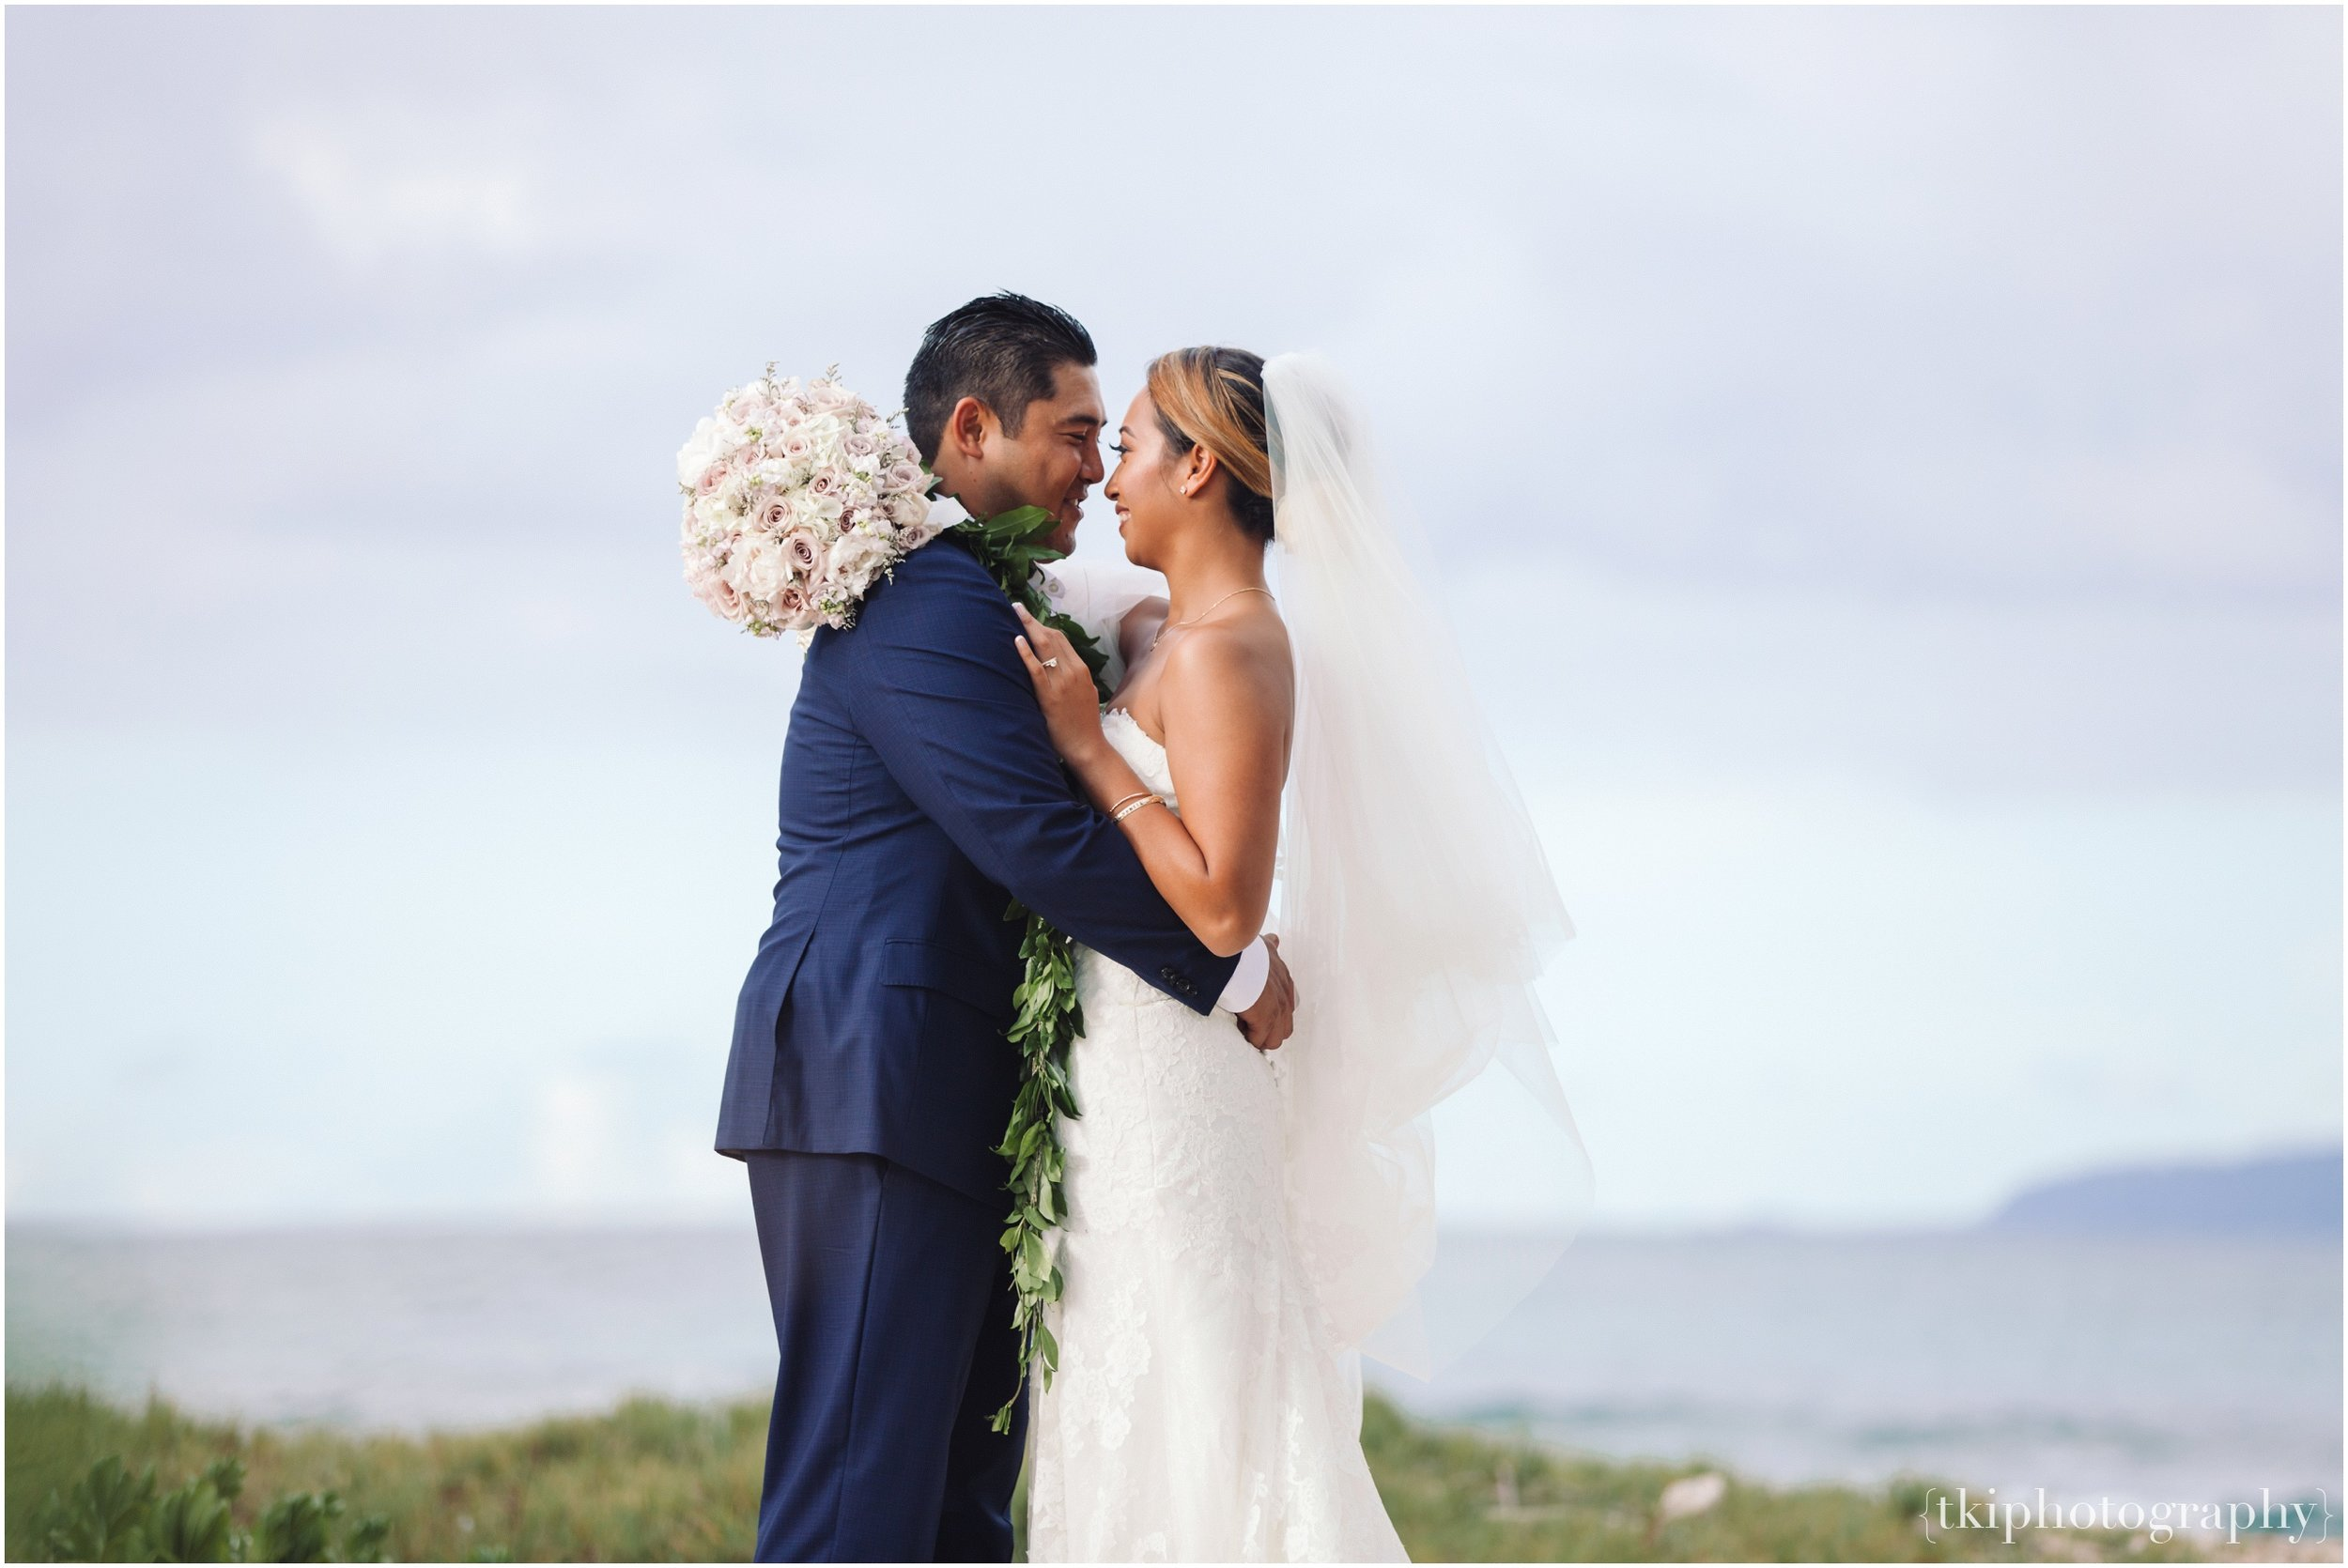 Oahu-Destination-Wedding-Beach_0107.jpg